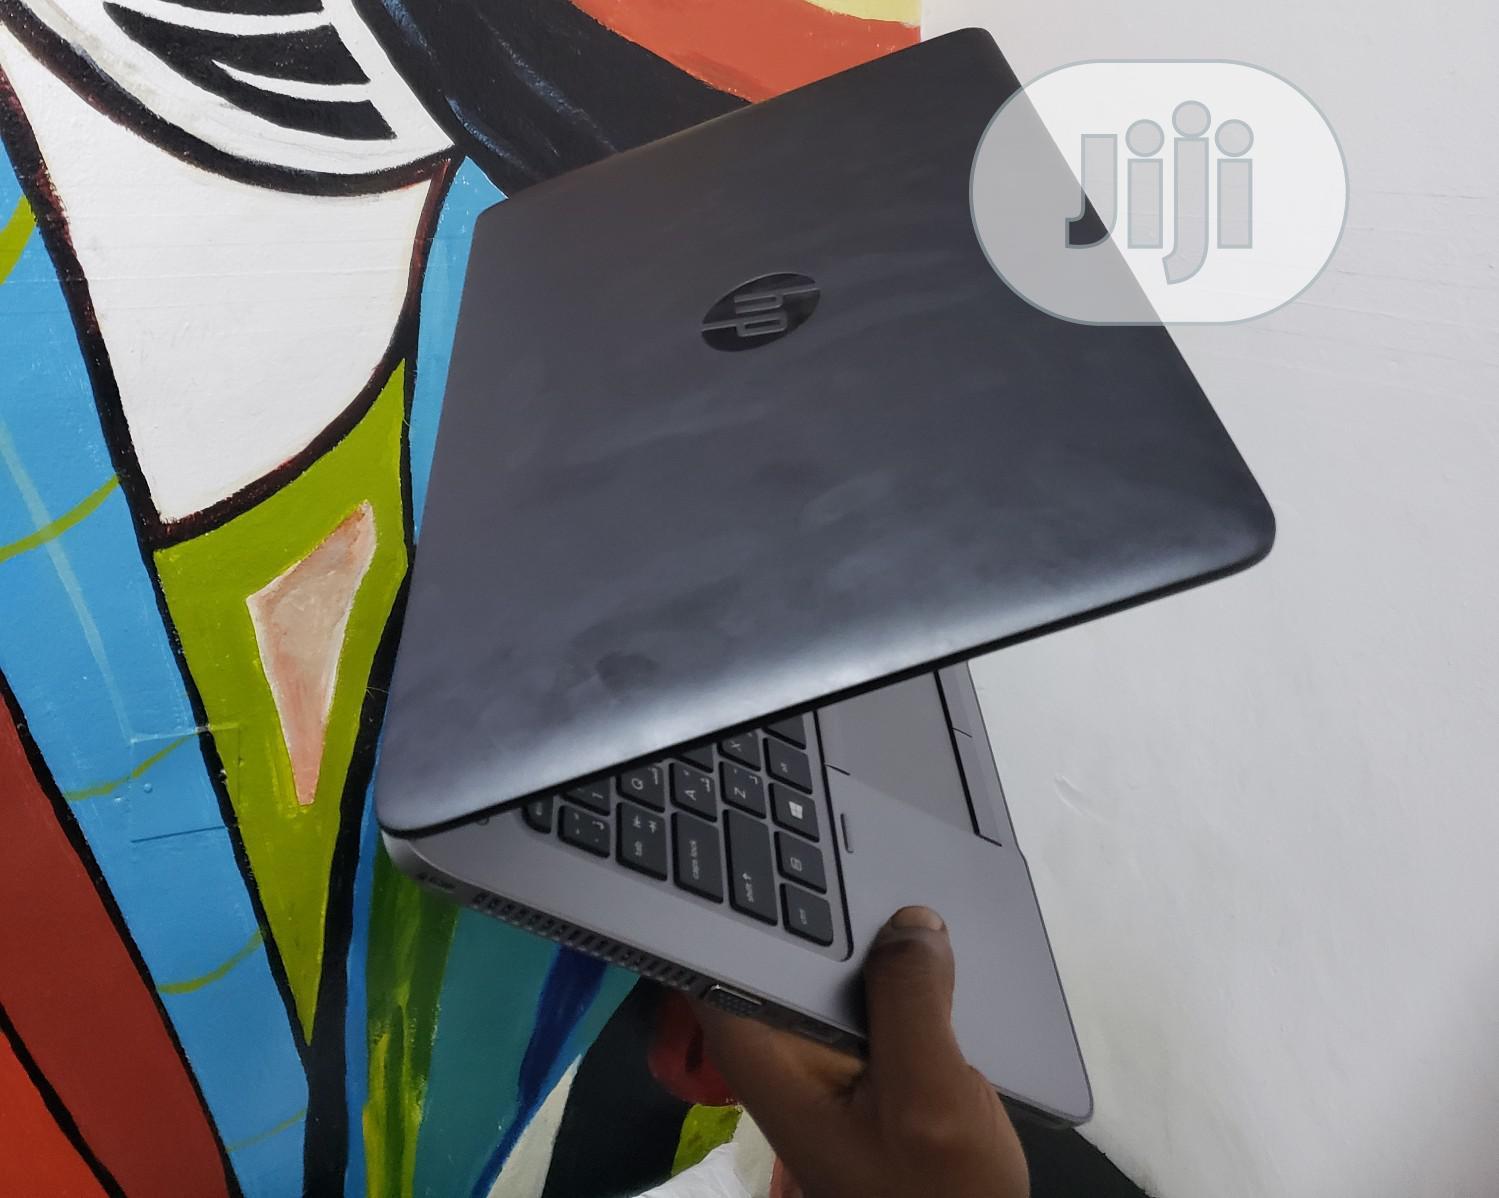 Laptop HP EliteBook 840 G1 4GB Intel Core I7 HDD 320GB | Laptops & Computers for sale in Ikeja, Lagos State, Nigeria